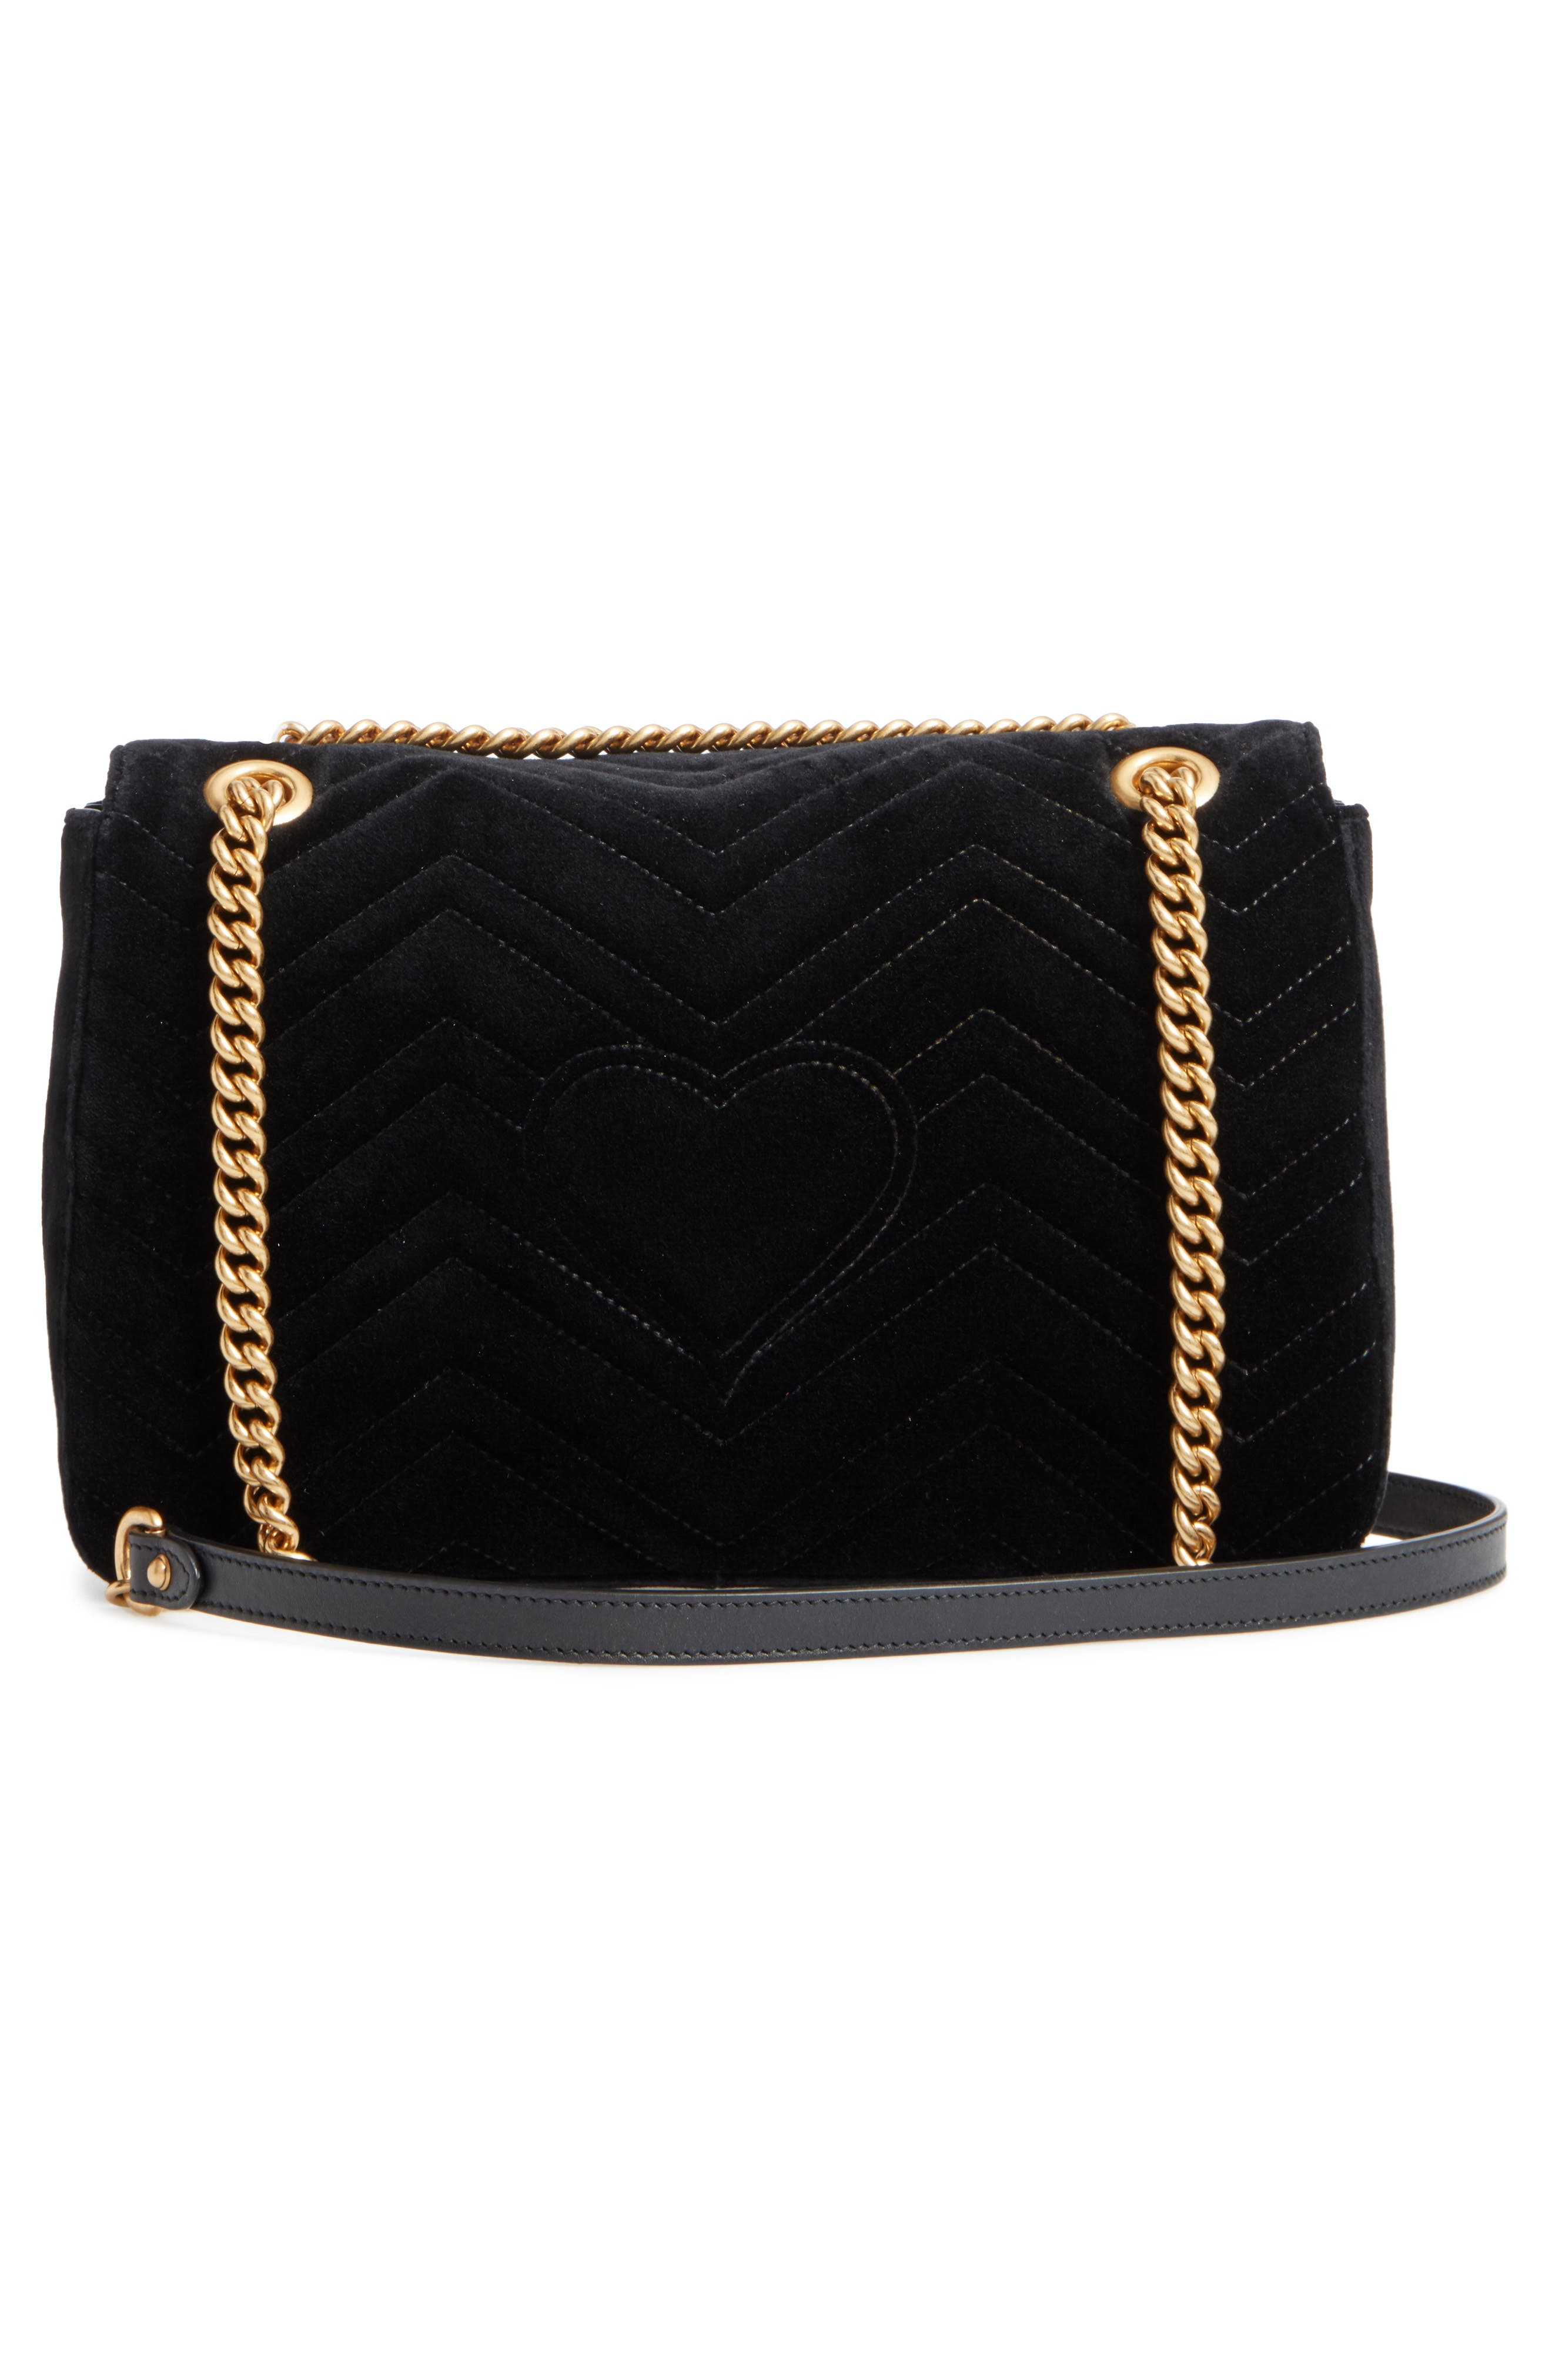 Alternate Image 3  - Gucci Medium GG Marmont 2.0 Matelassé Velvet Shoulder Bag